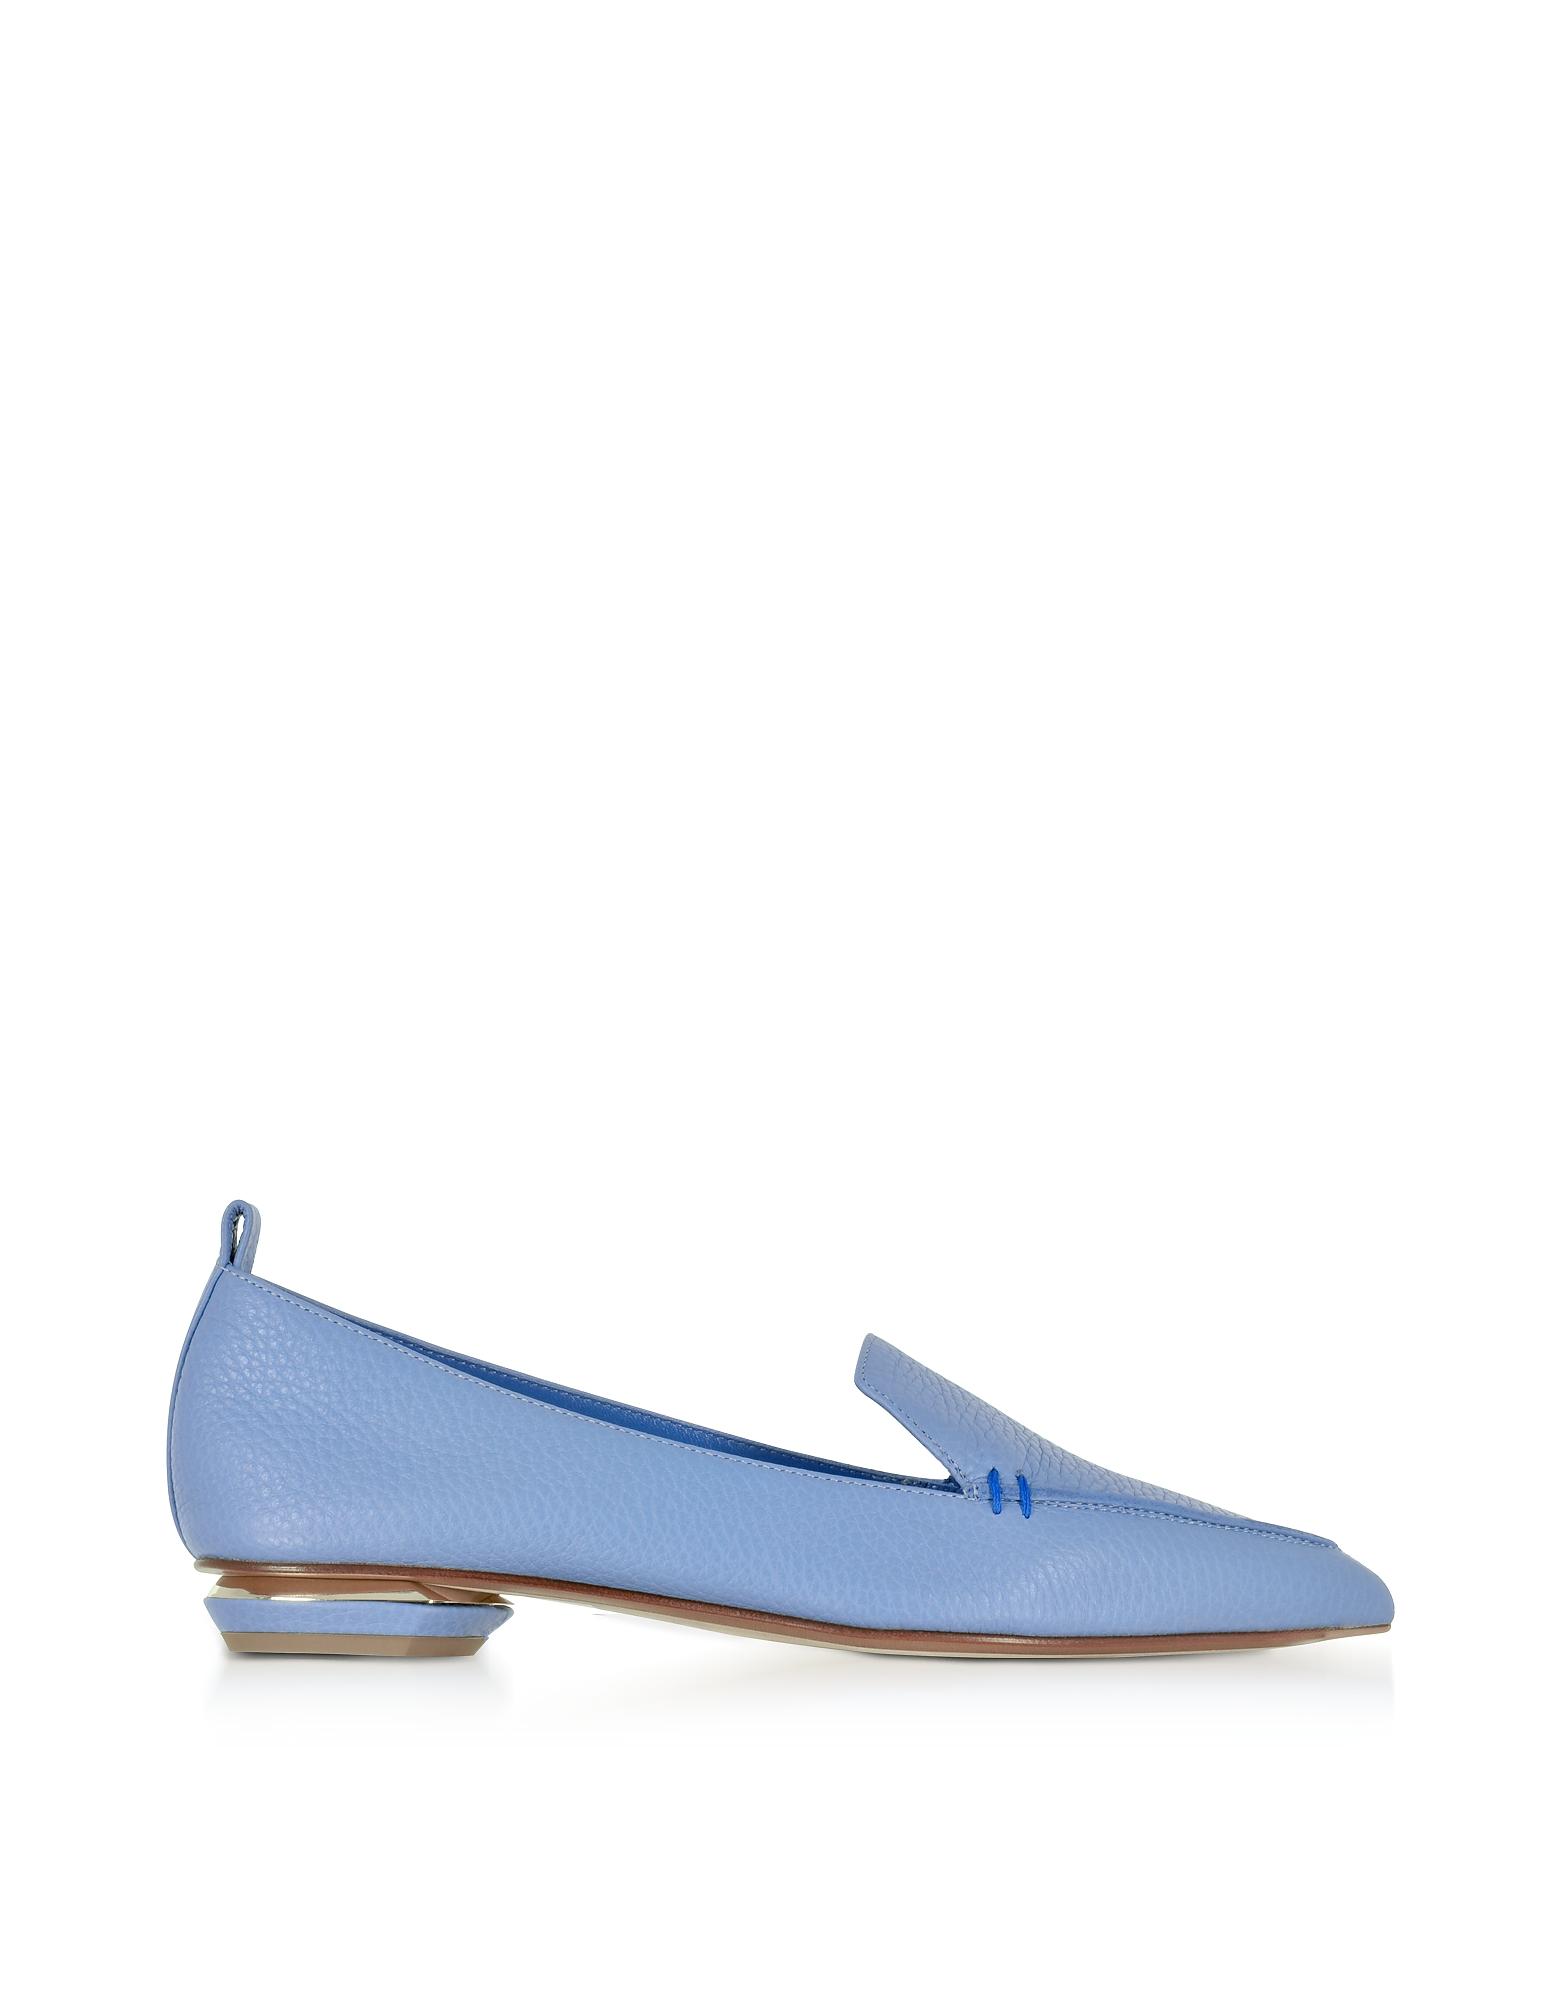 Nicholas Kirkwood Shoes, Beya Sky Blue Tumbled Leather Loafer